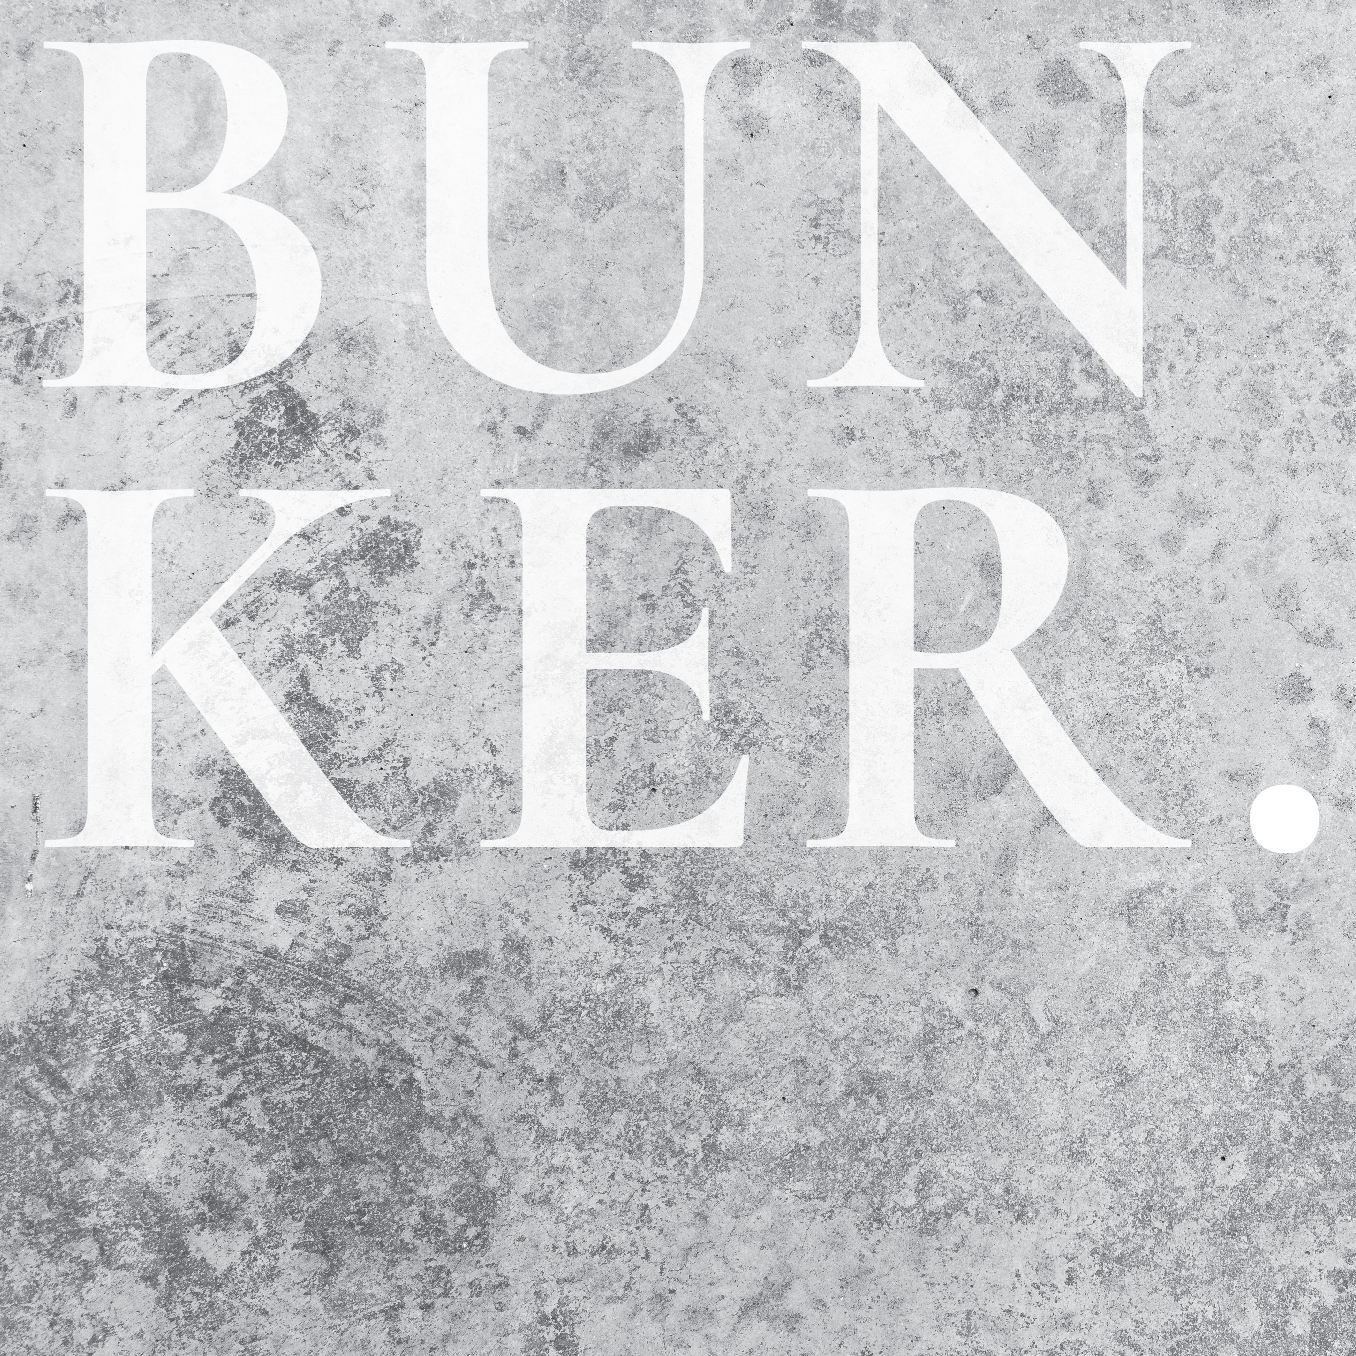 BUNKER_FBICON-04.jpg